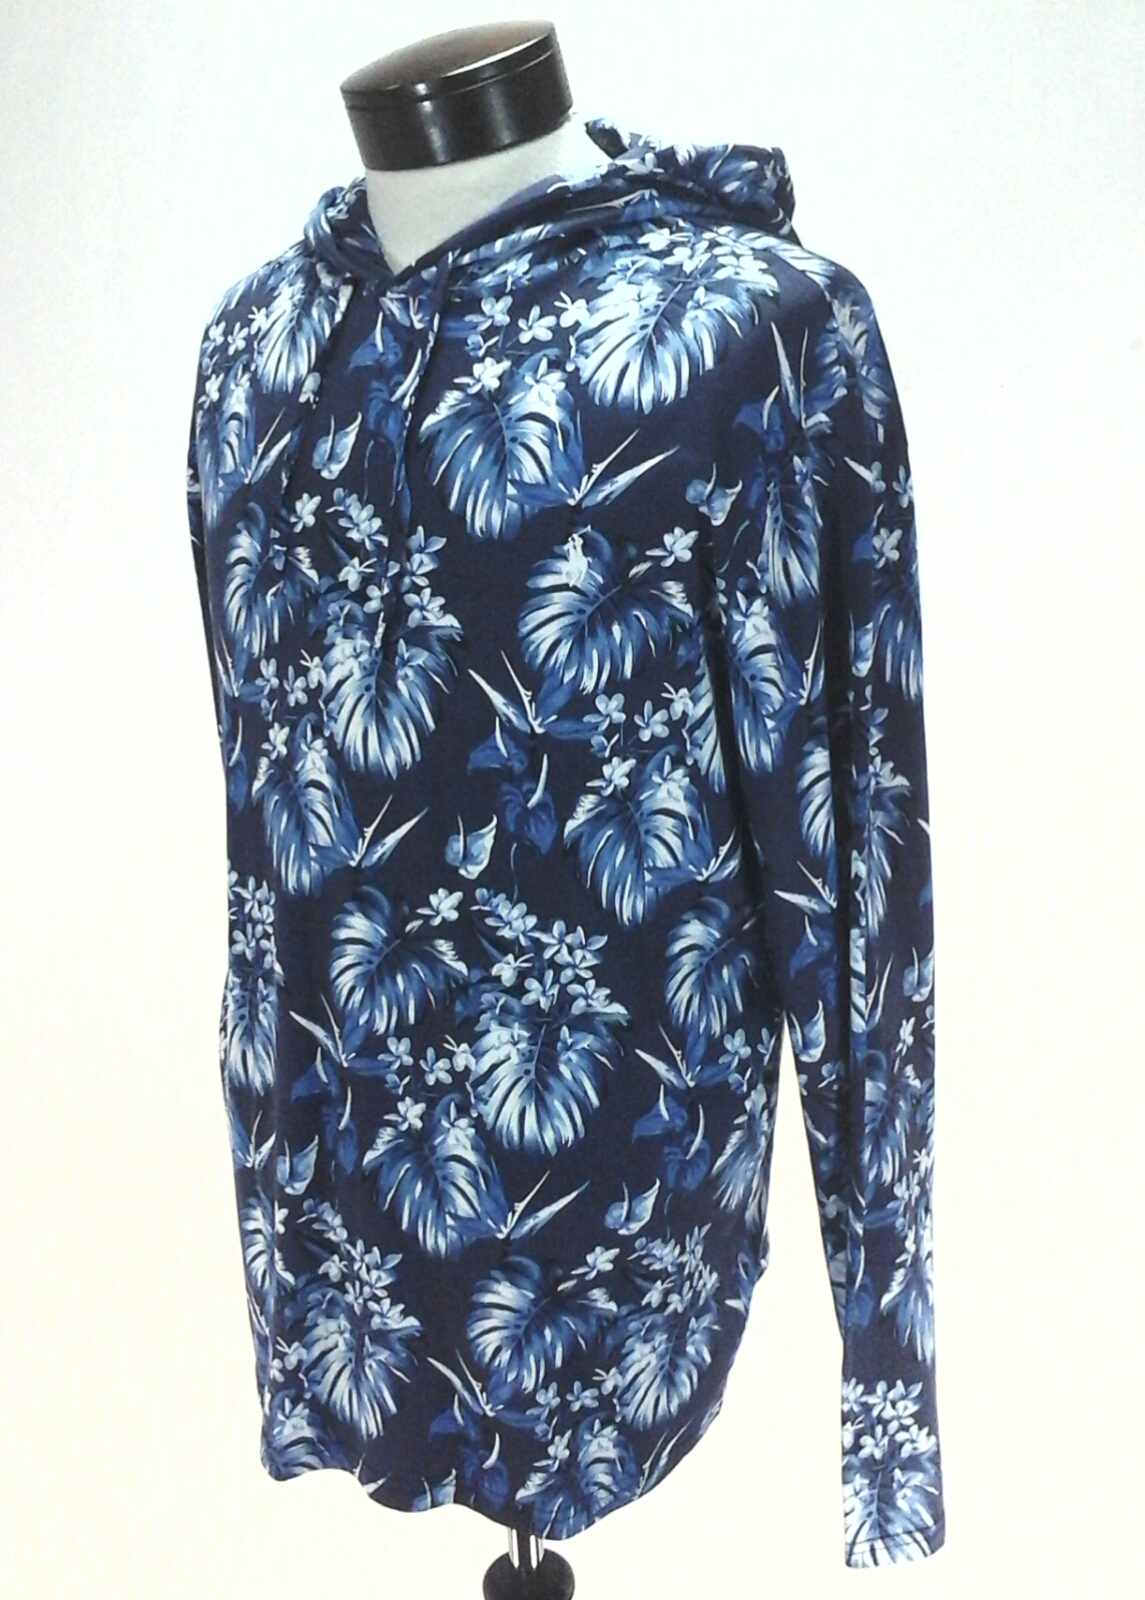 Polo Ralph Lauren Hooded T Shirt Blue Hawaiian Palm Floral Hoodie Mens New Ebay